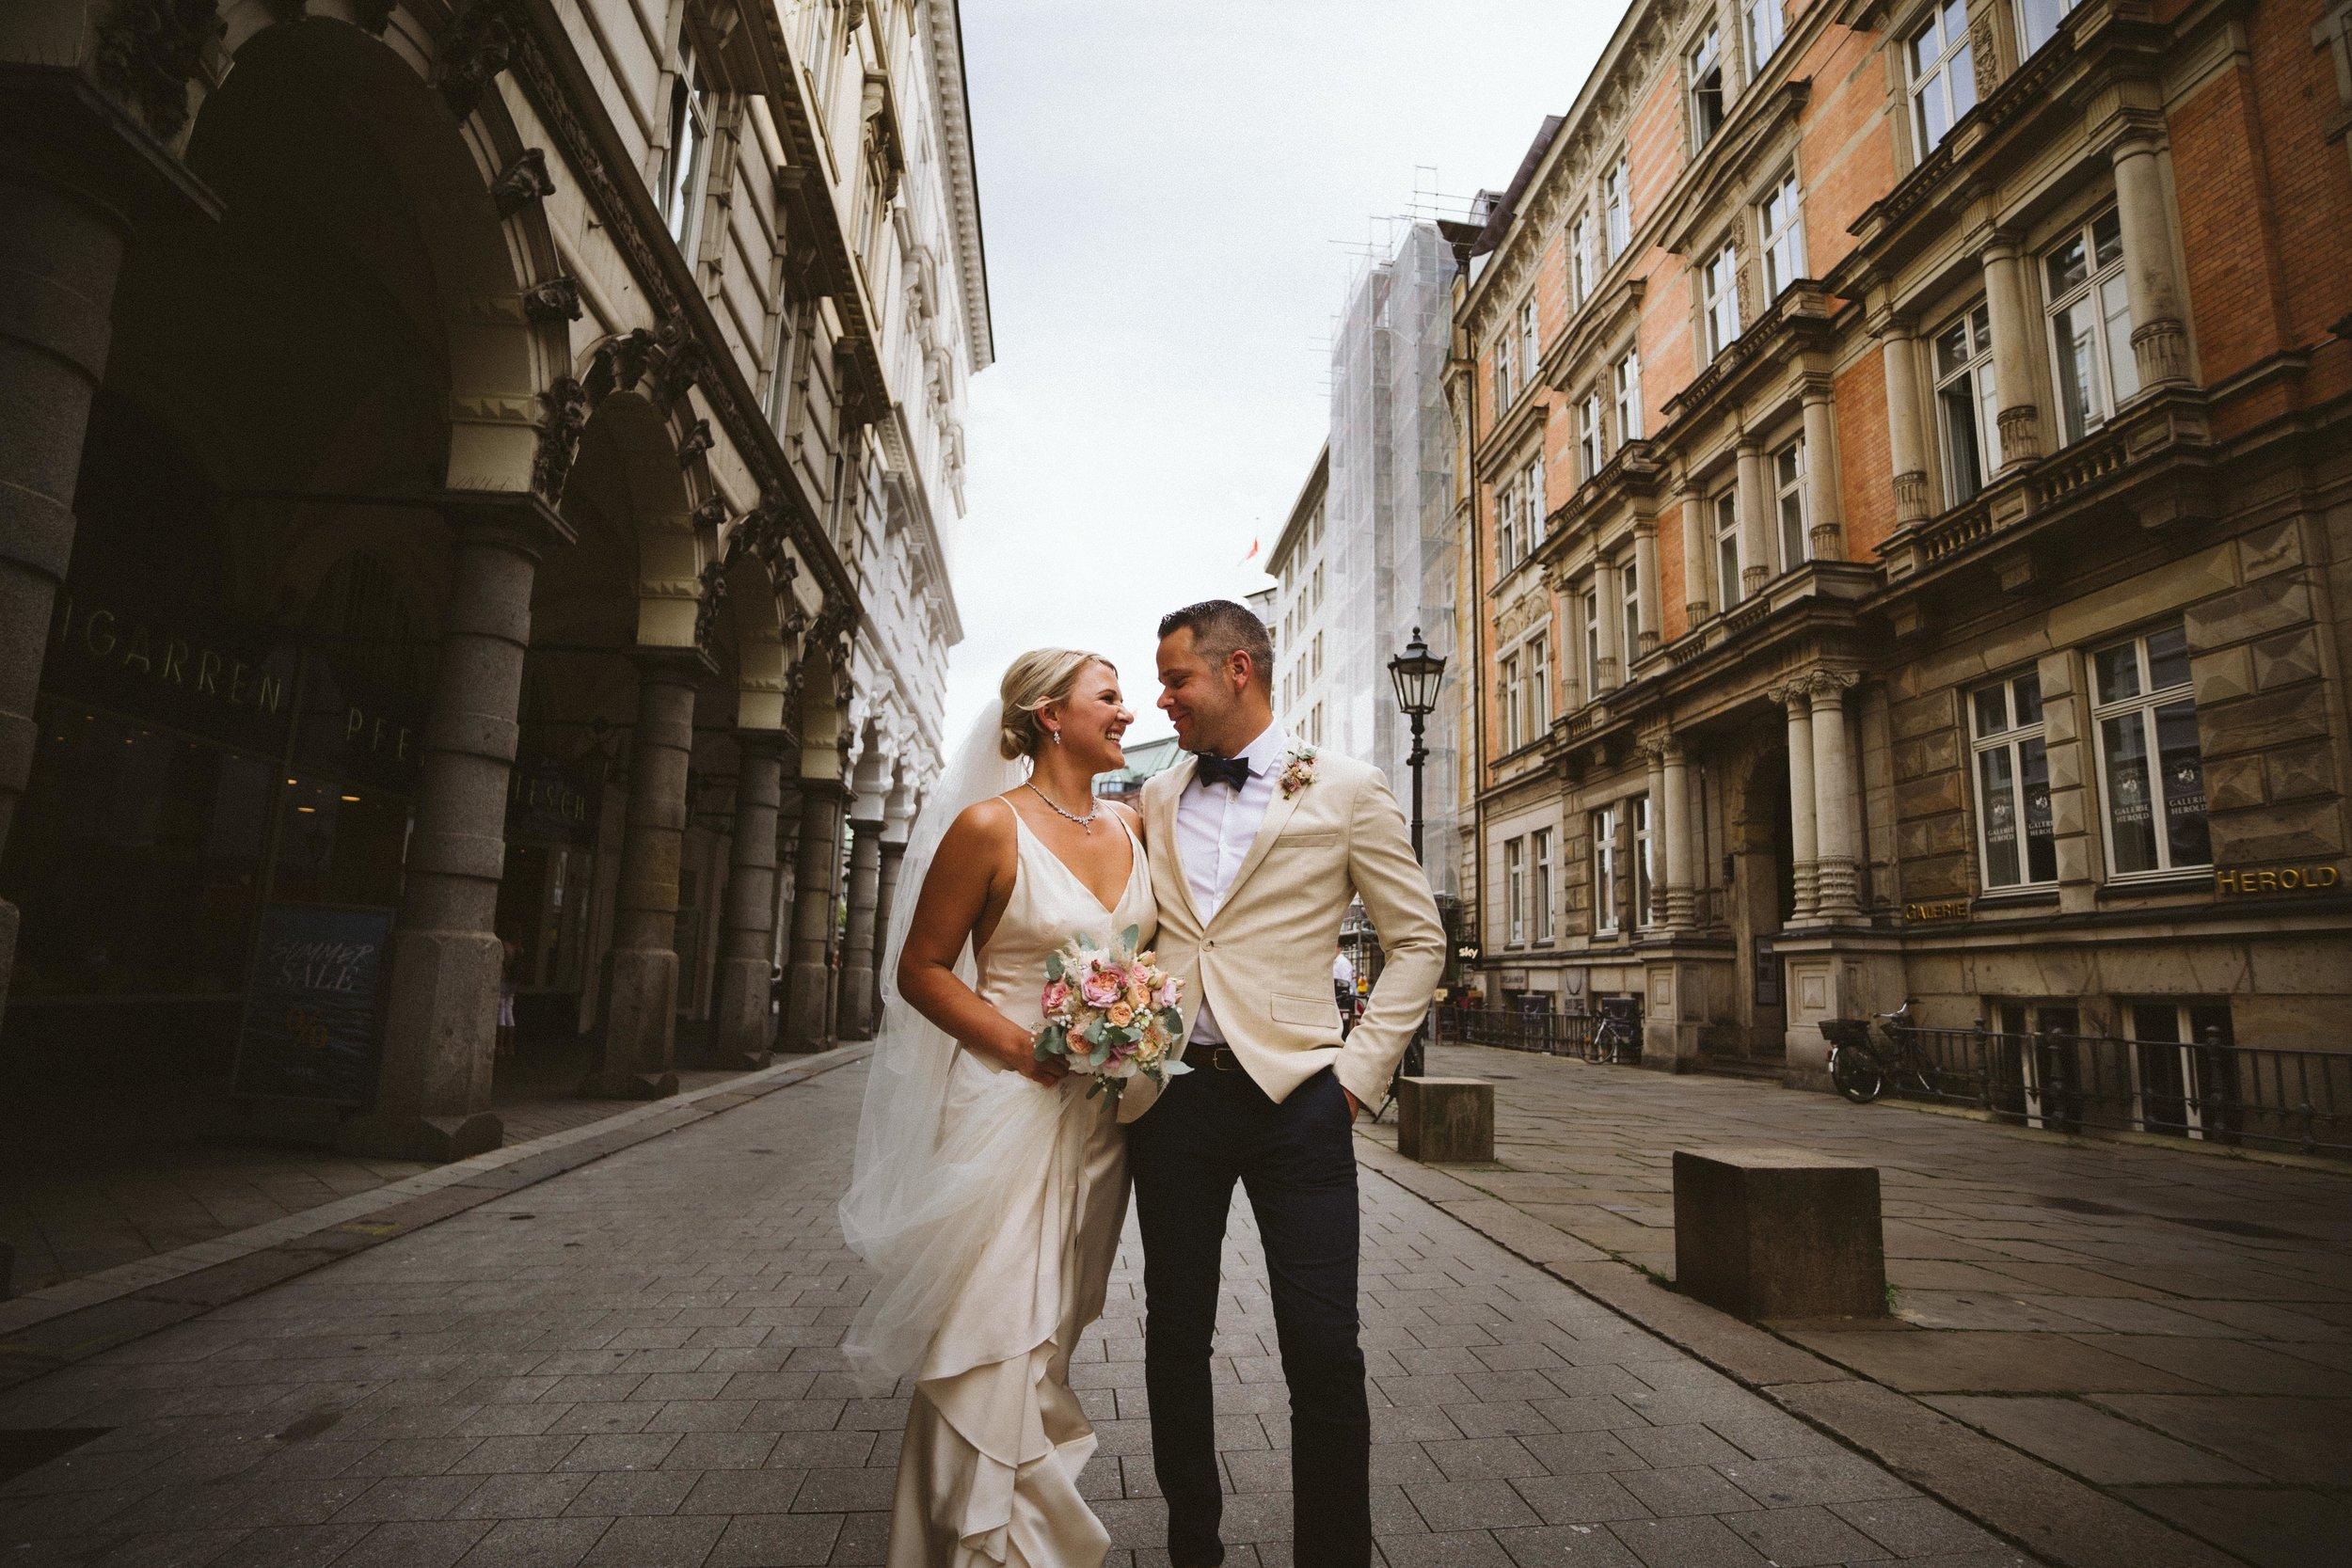 The bride and groom in Hamburg